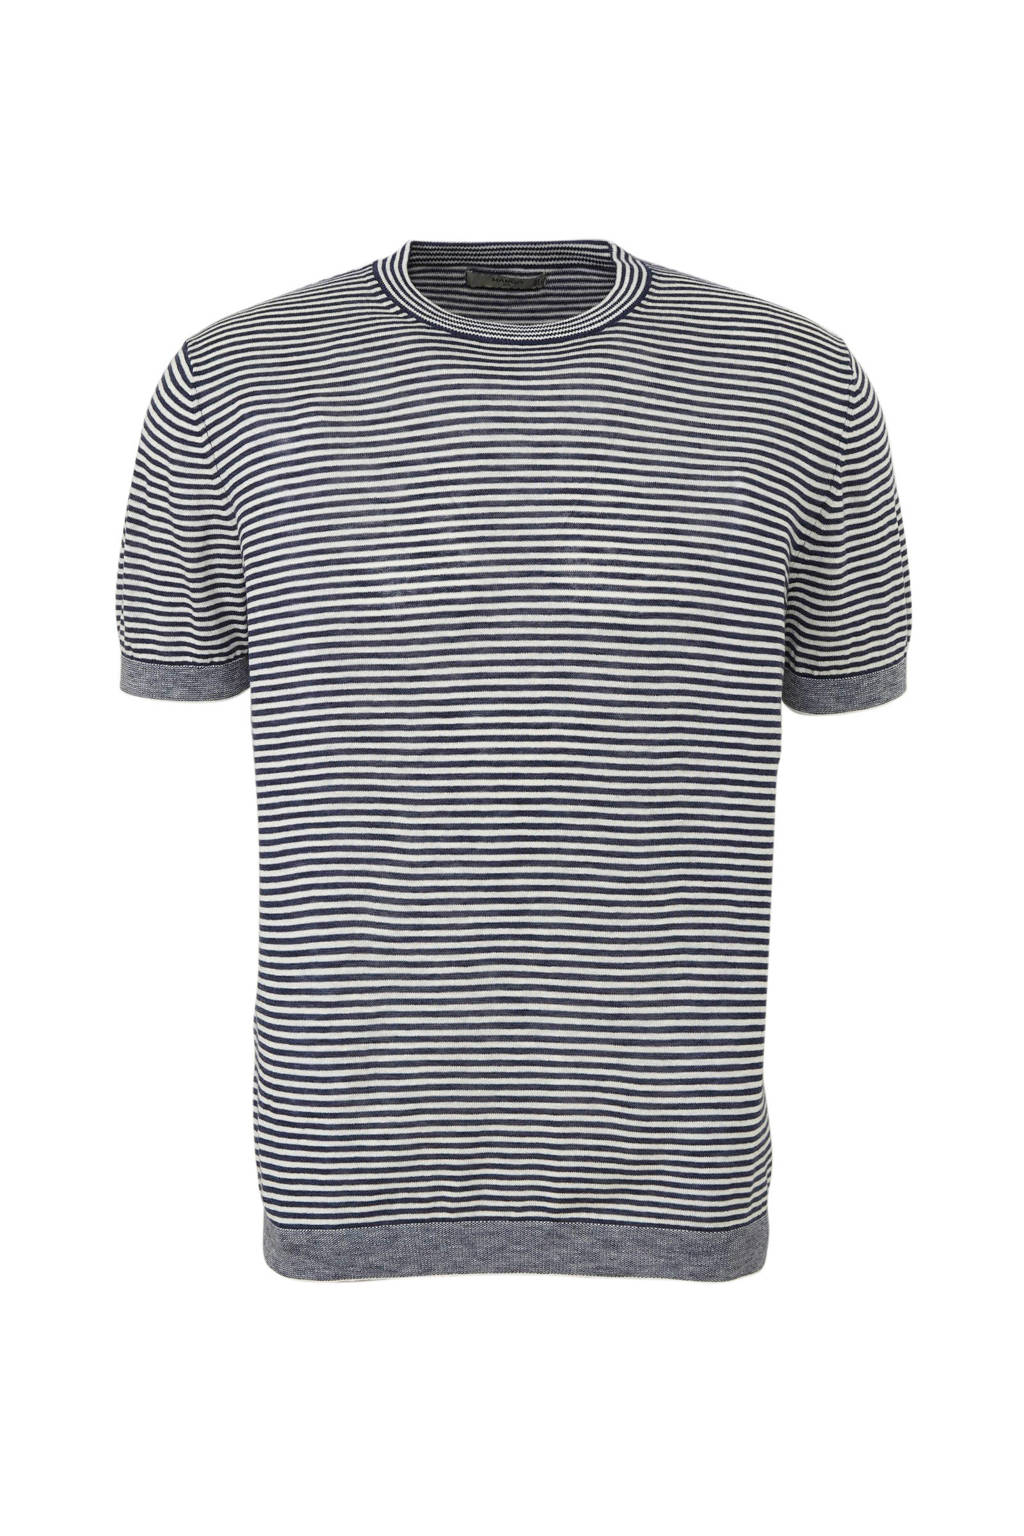 Mango Man fijn gebreid T-shirt, Blauw